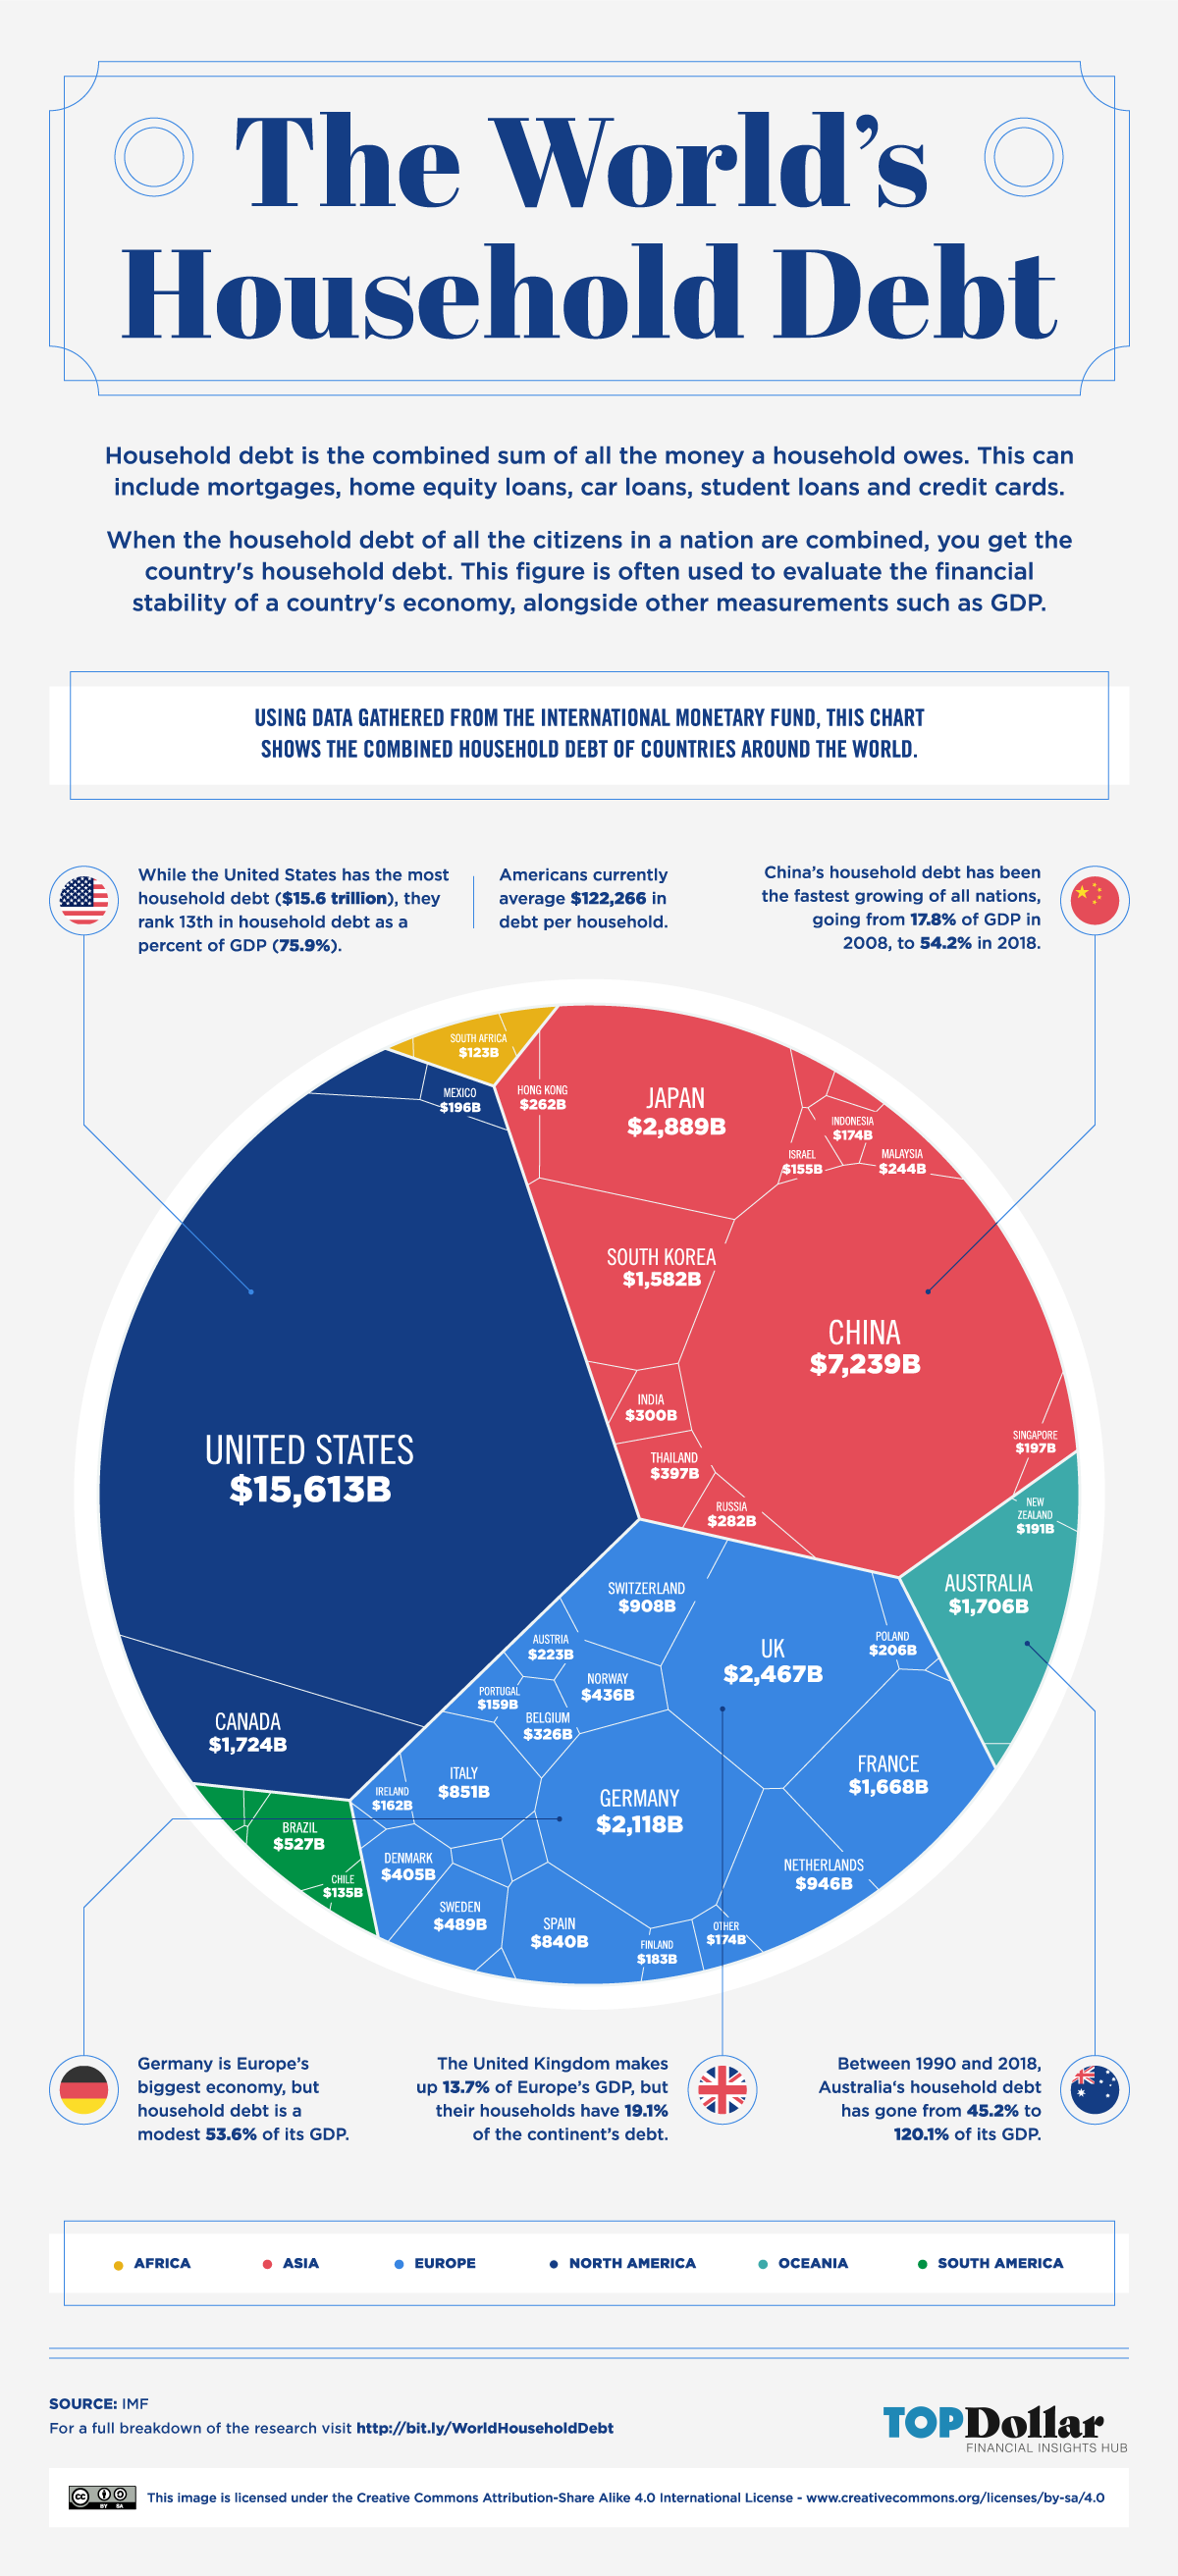 Voronoi Diagram - The World's Household Debt